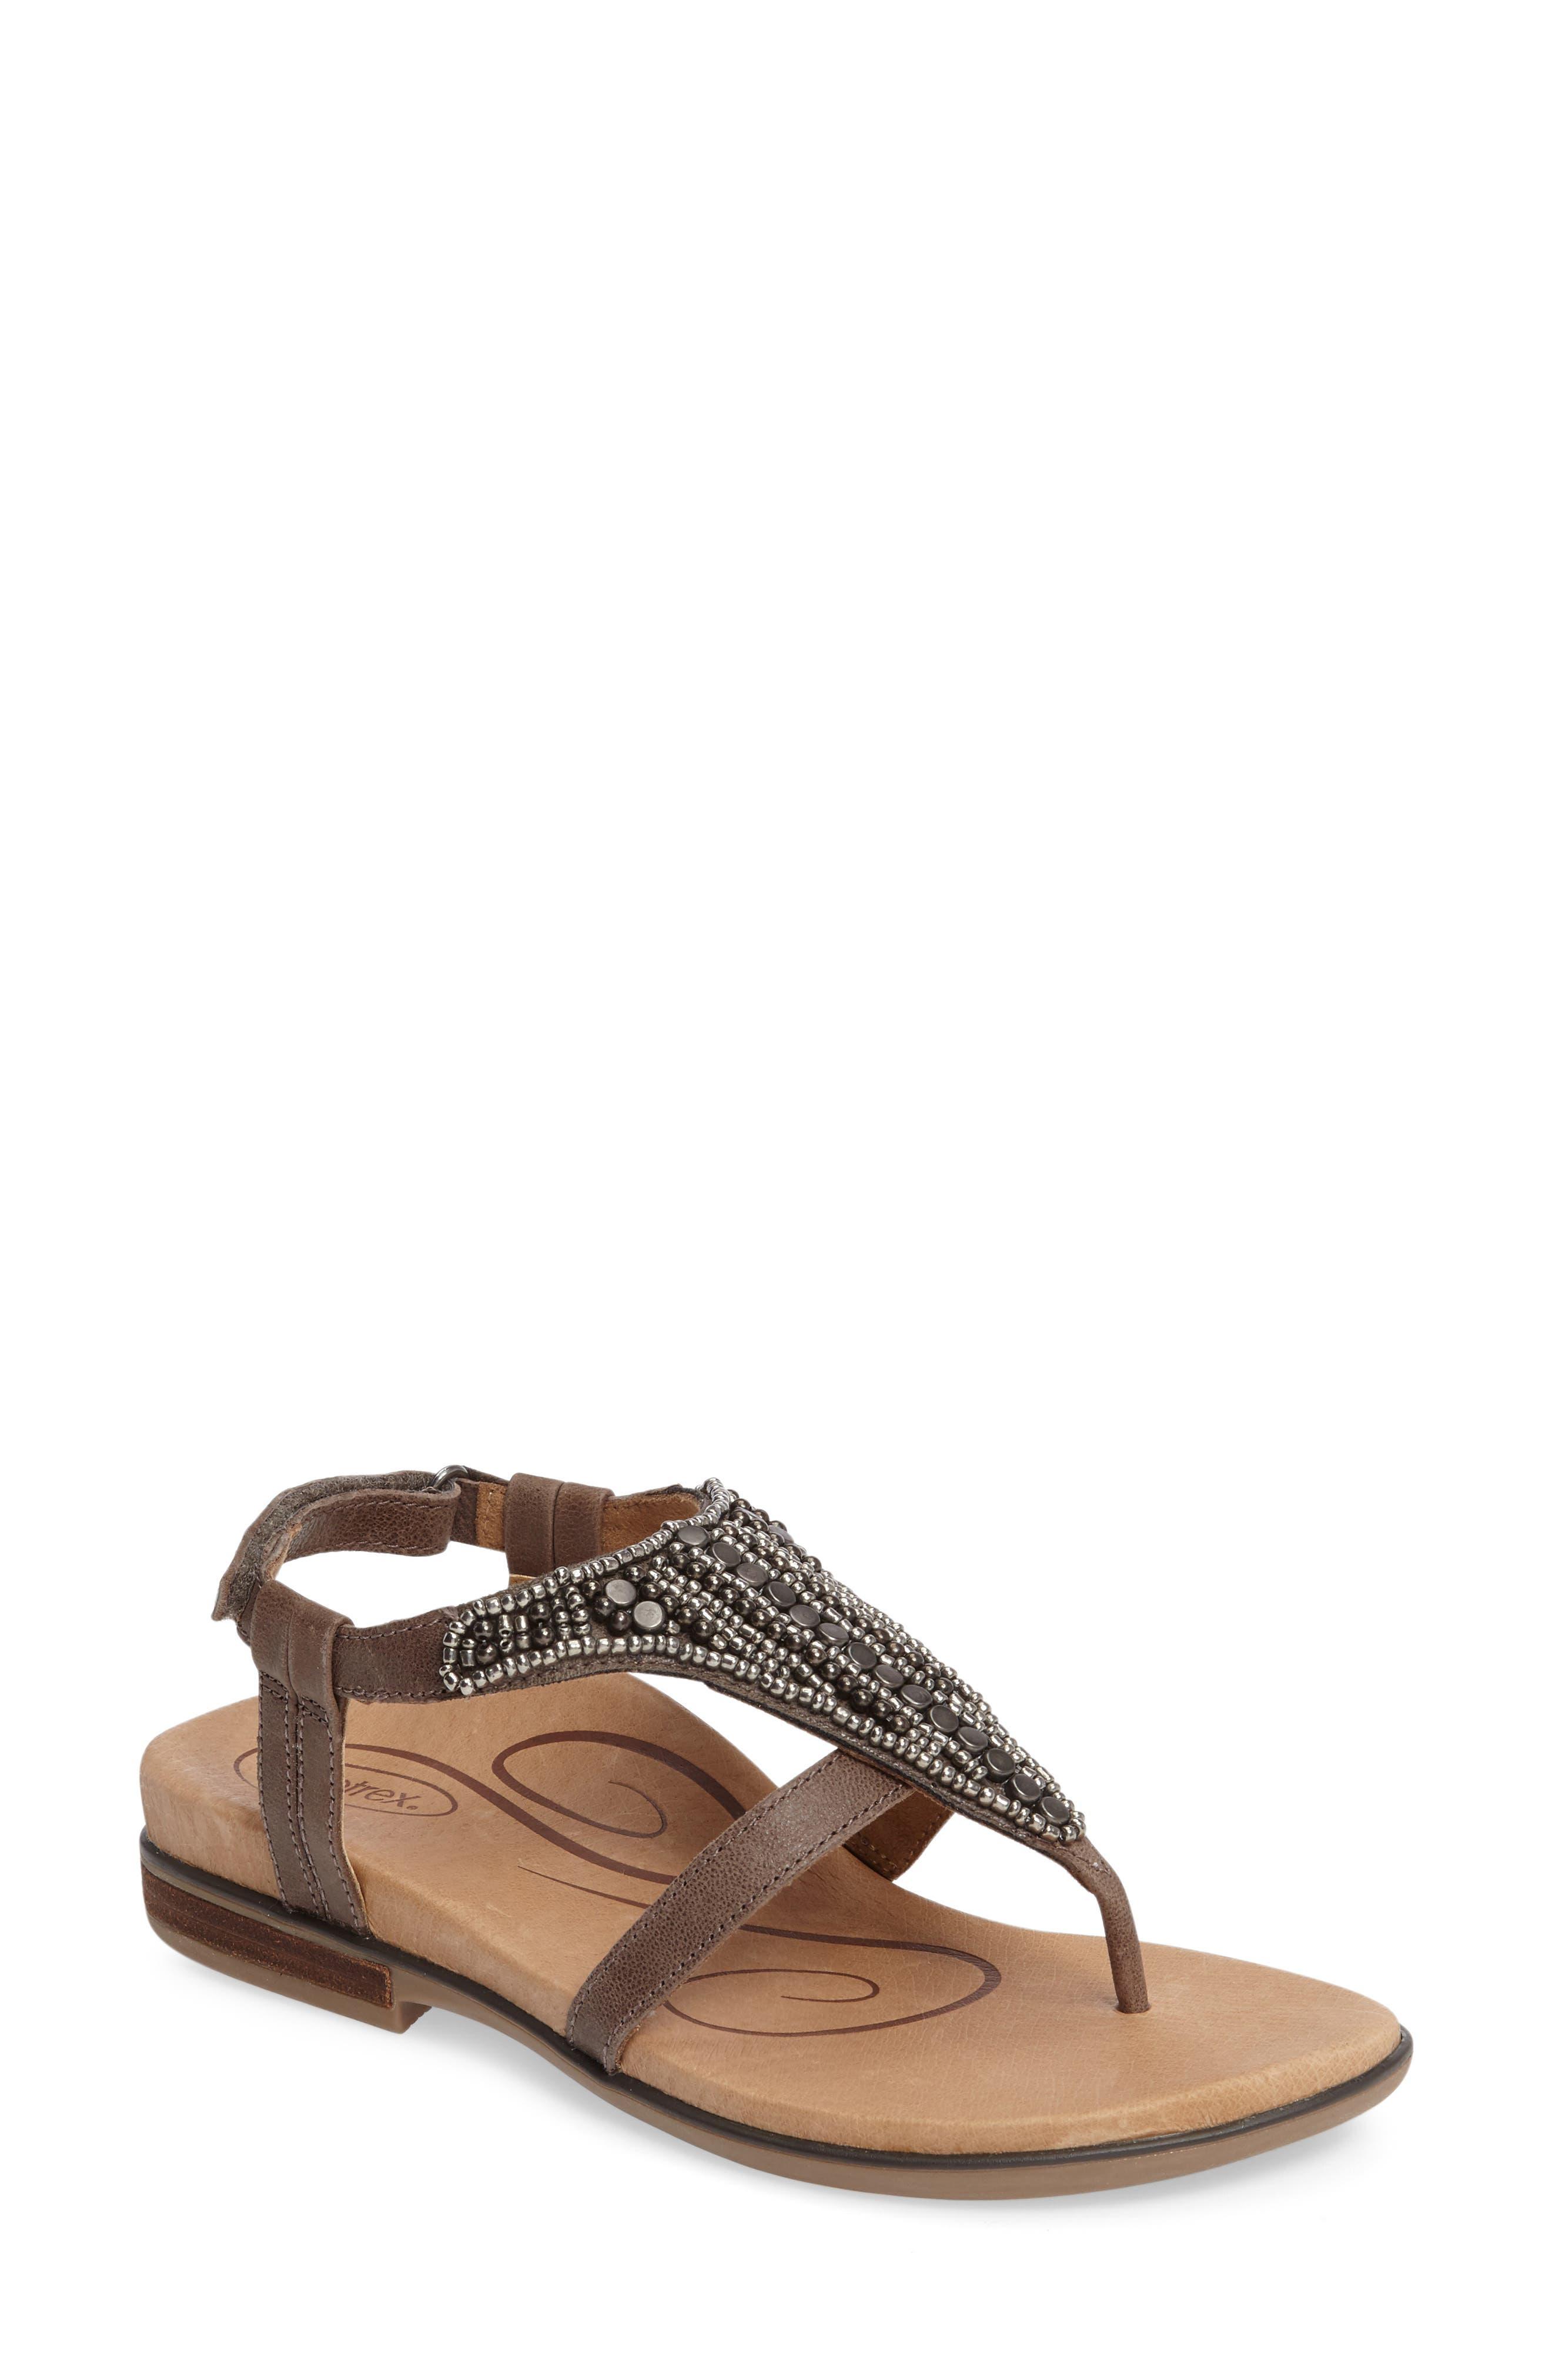 Sheila Embellished Sandal,                         Main,                         color, Stone Leather